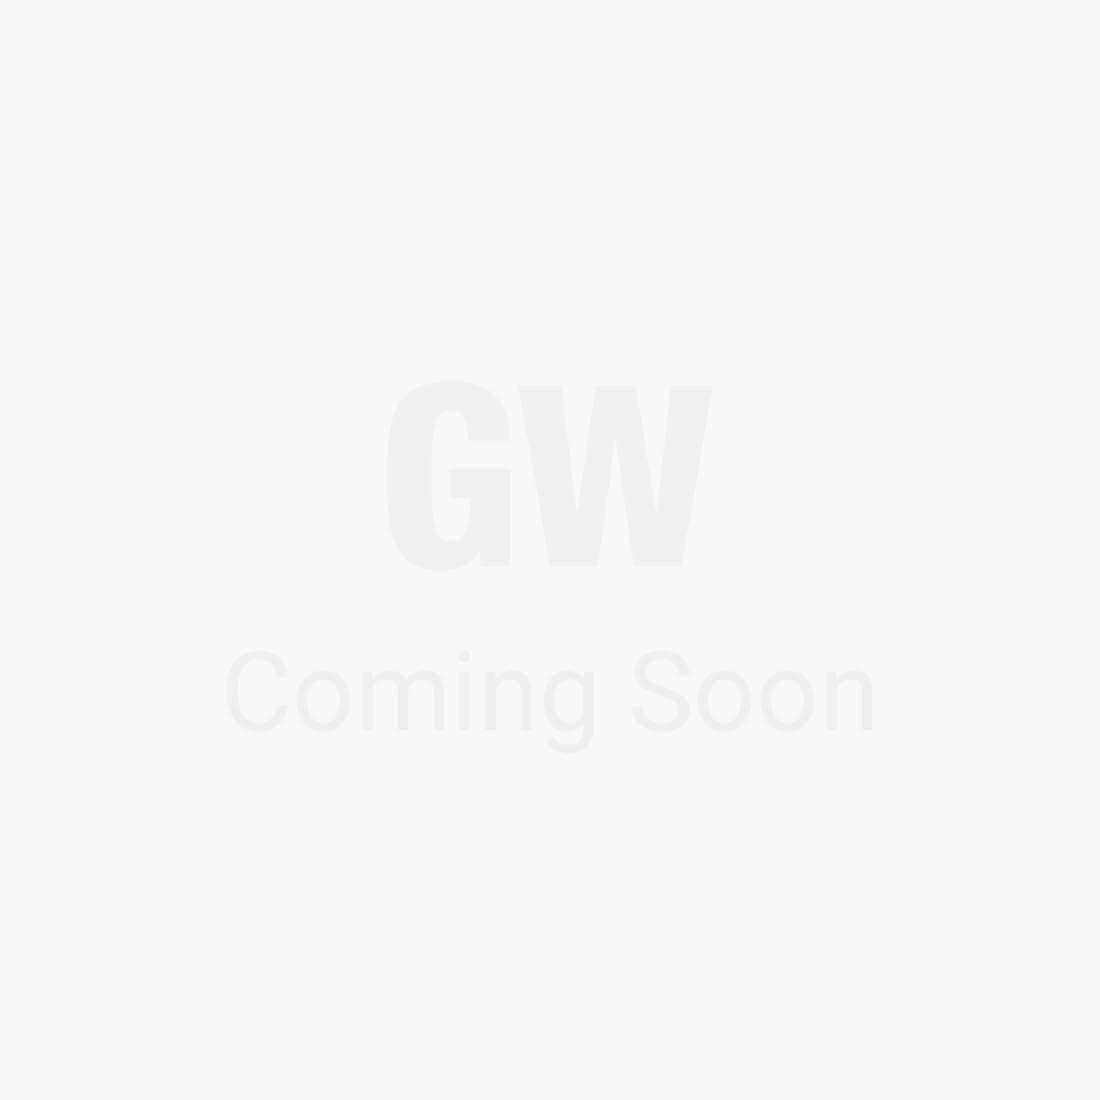 Elle Pillar Round Dining Tables